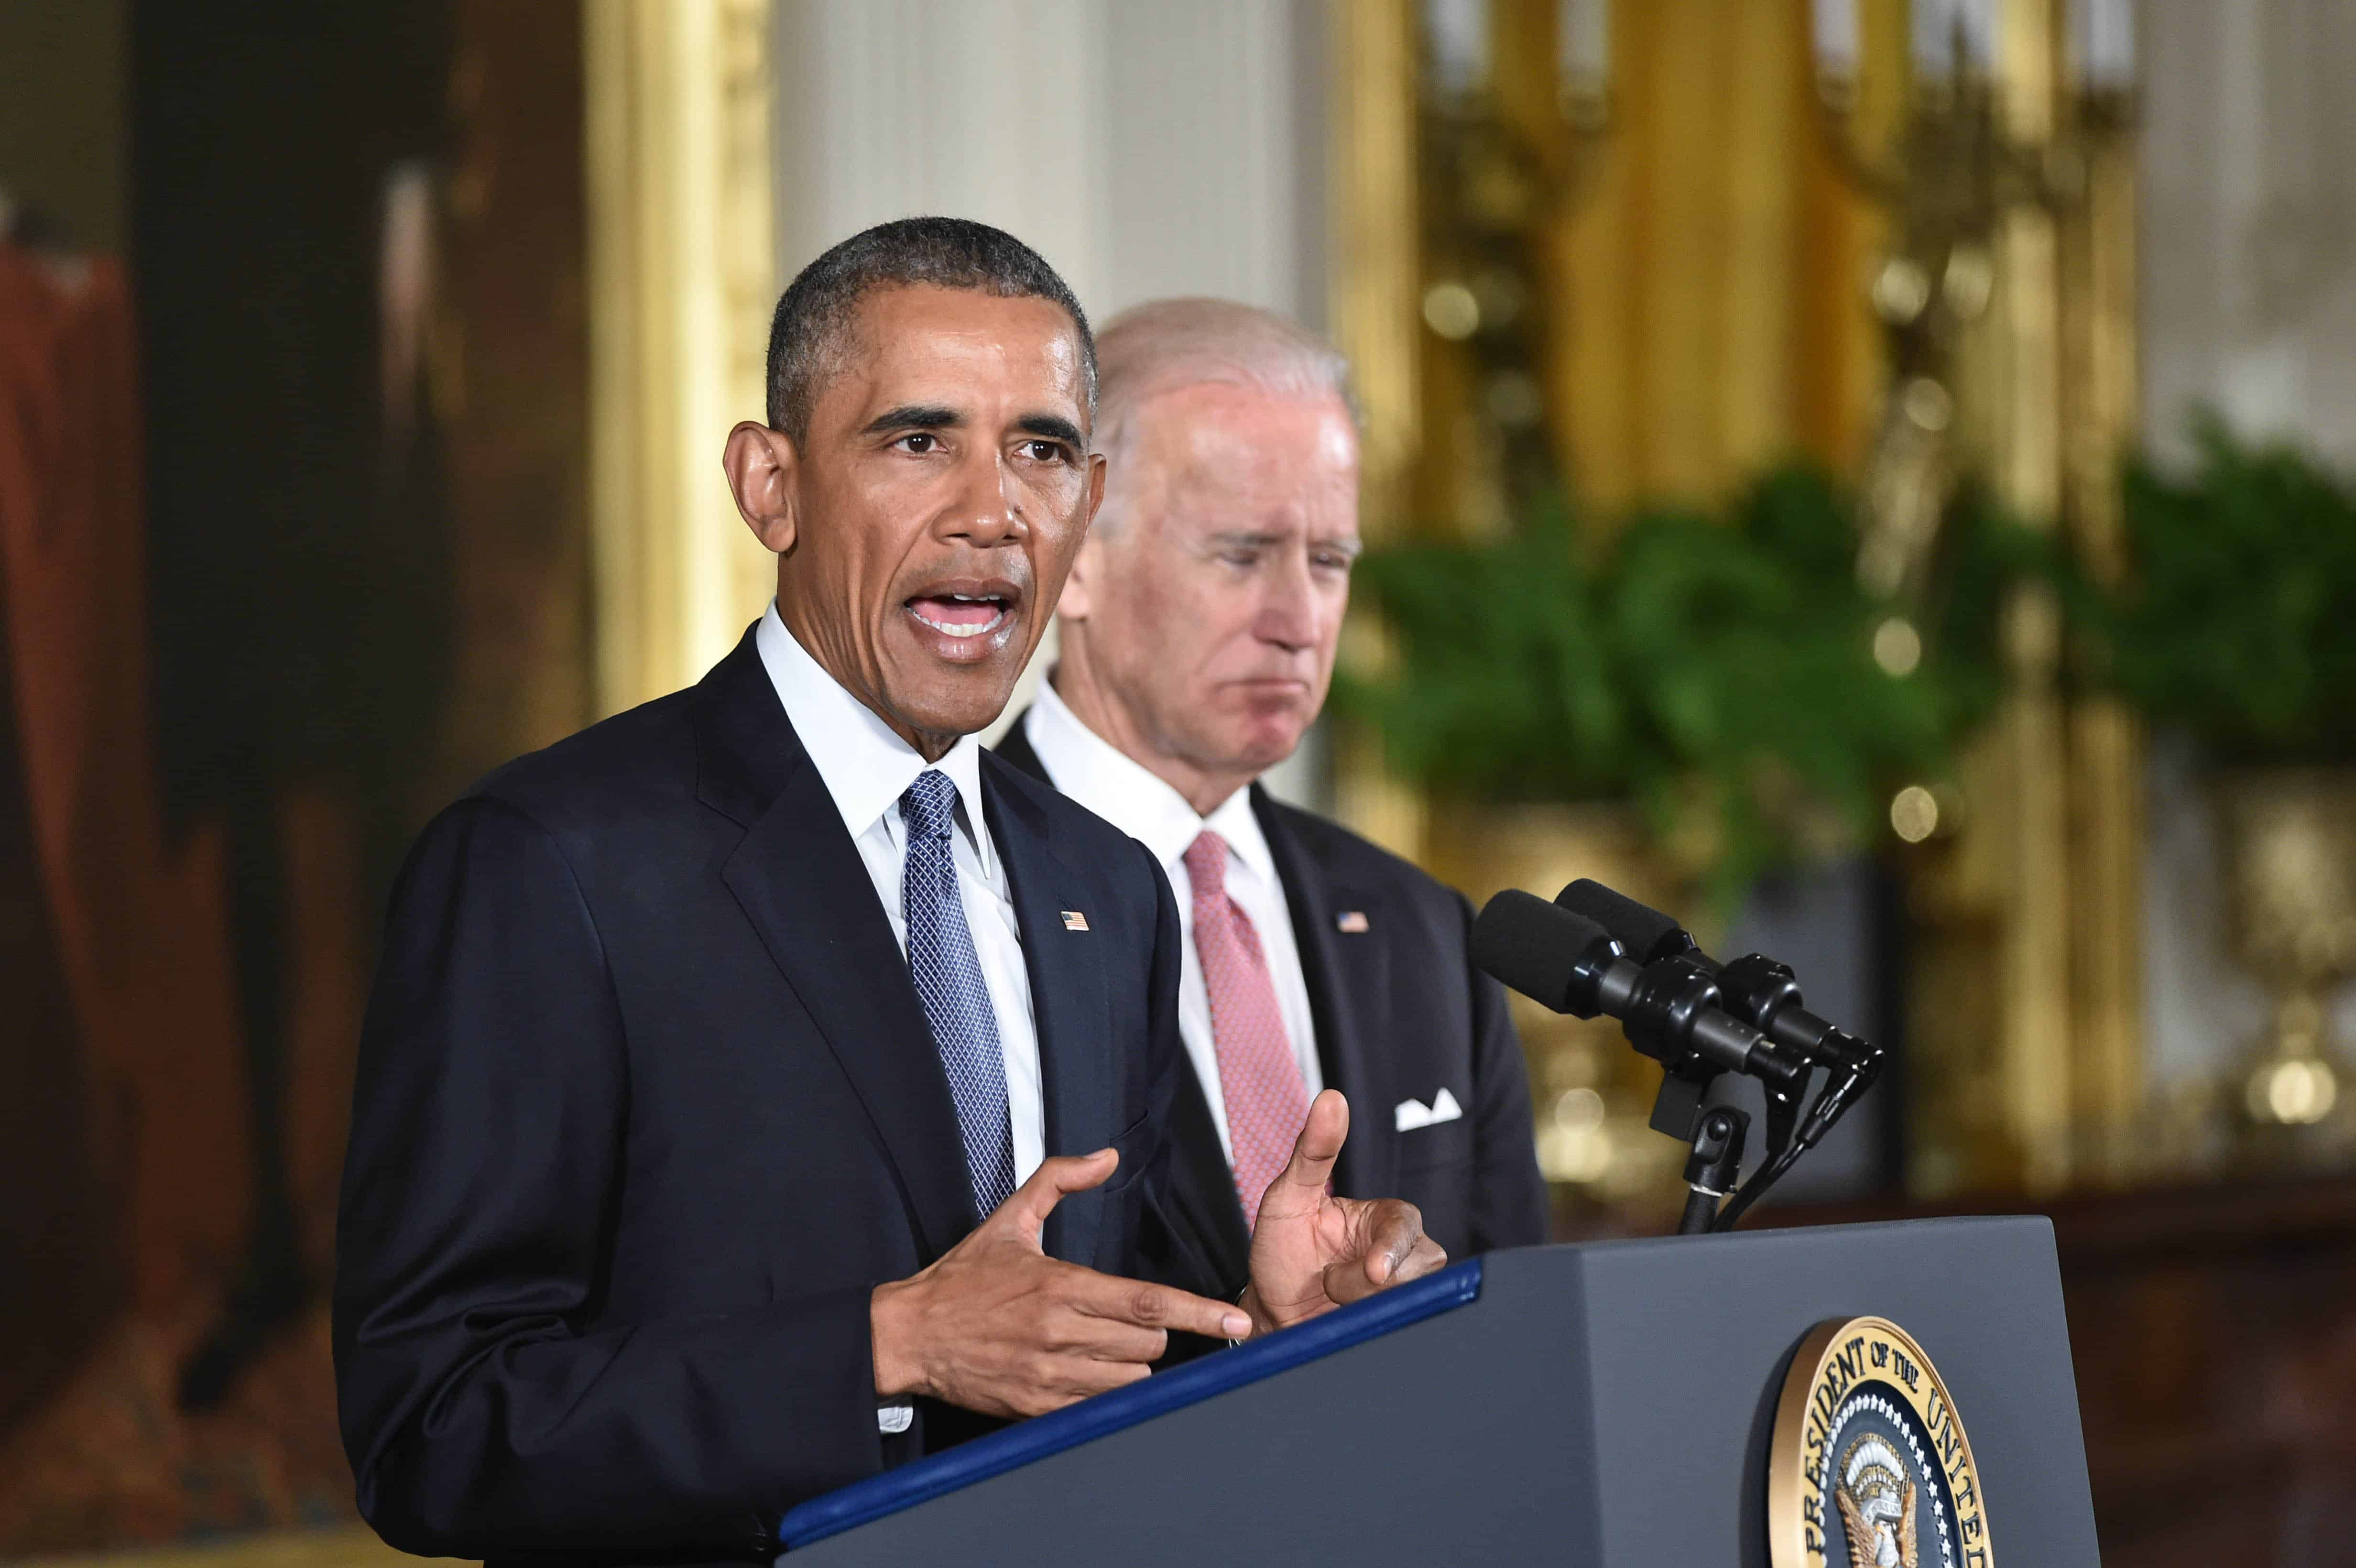 U.S. President Barack Obama speaks on gun control